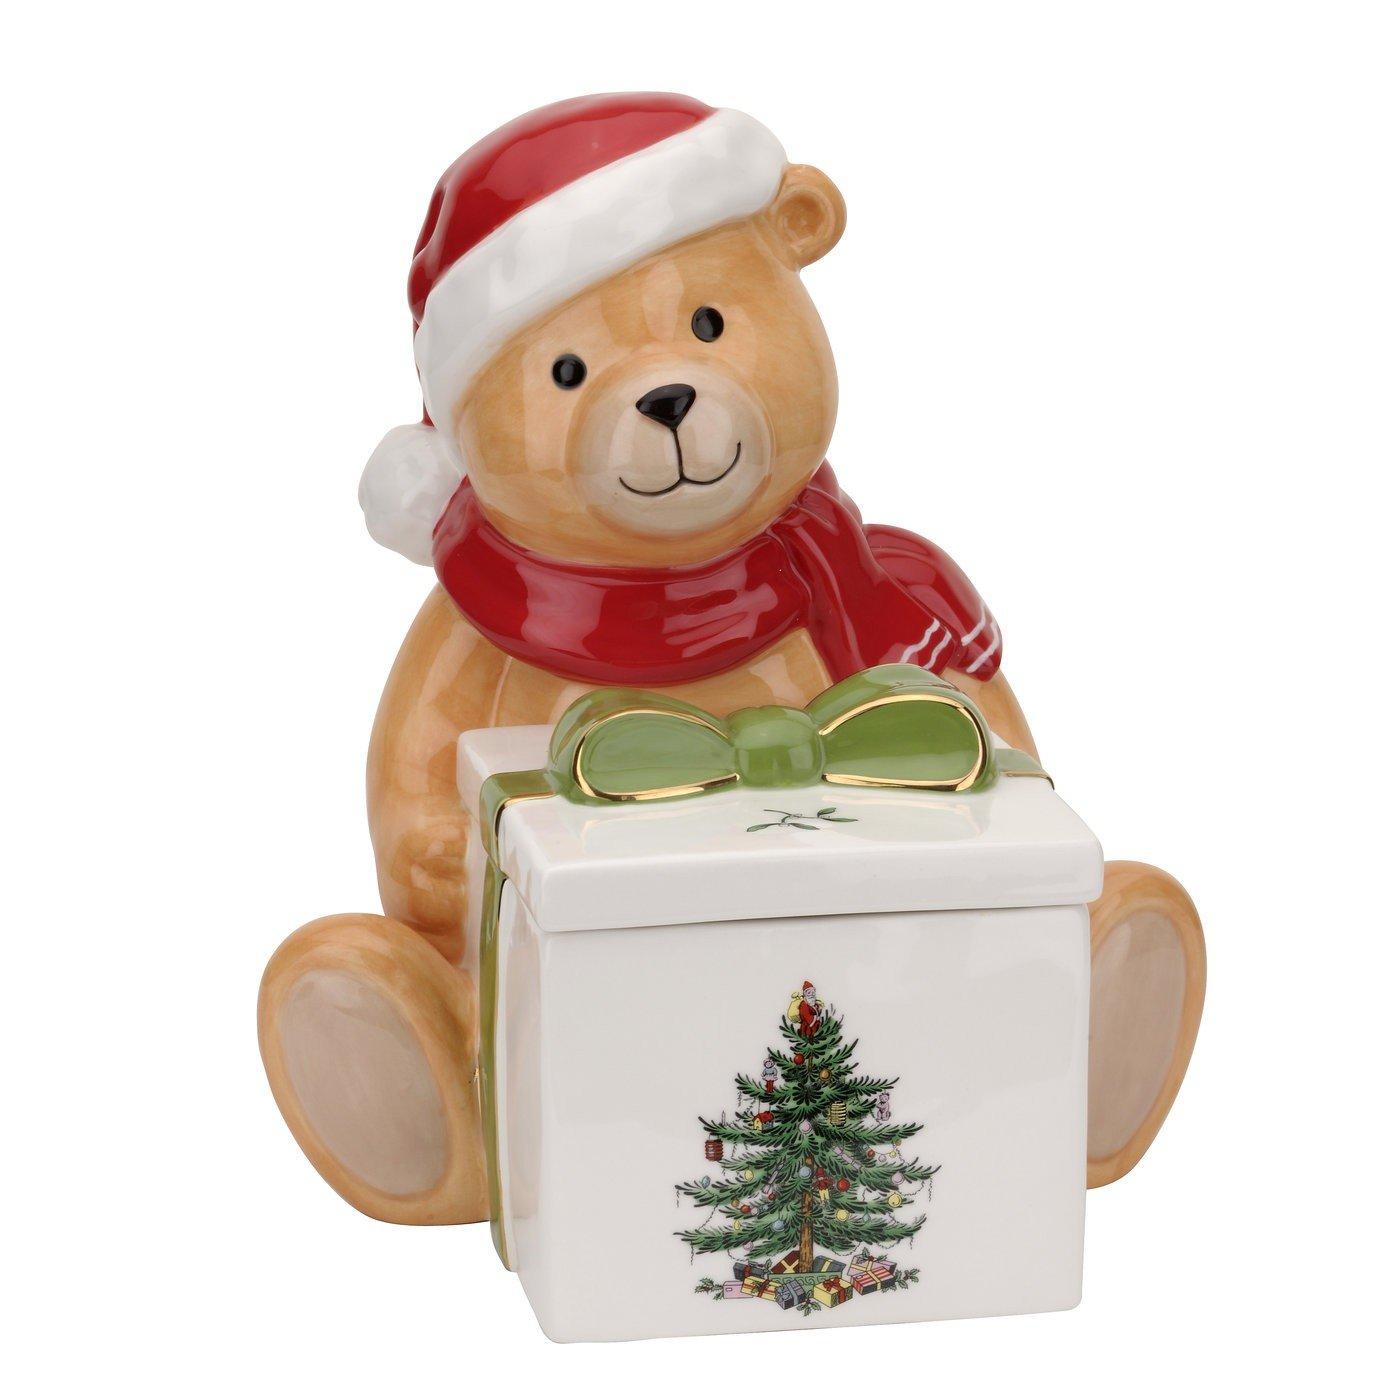 Spode Christmas Tree Teddy Bear Candy Box